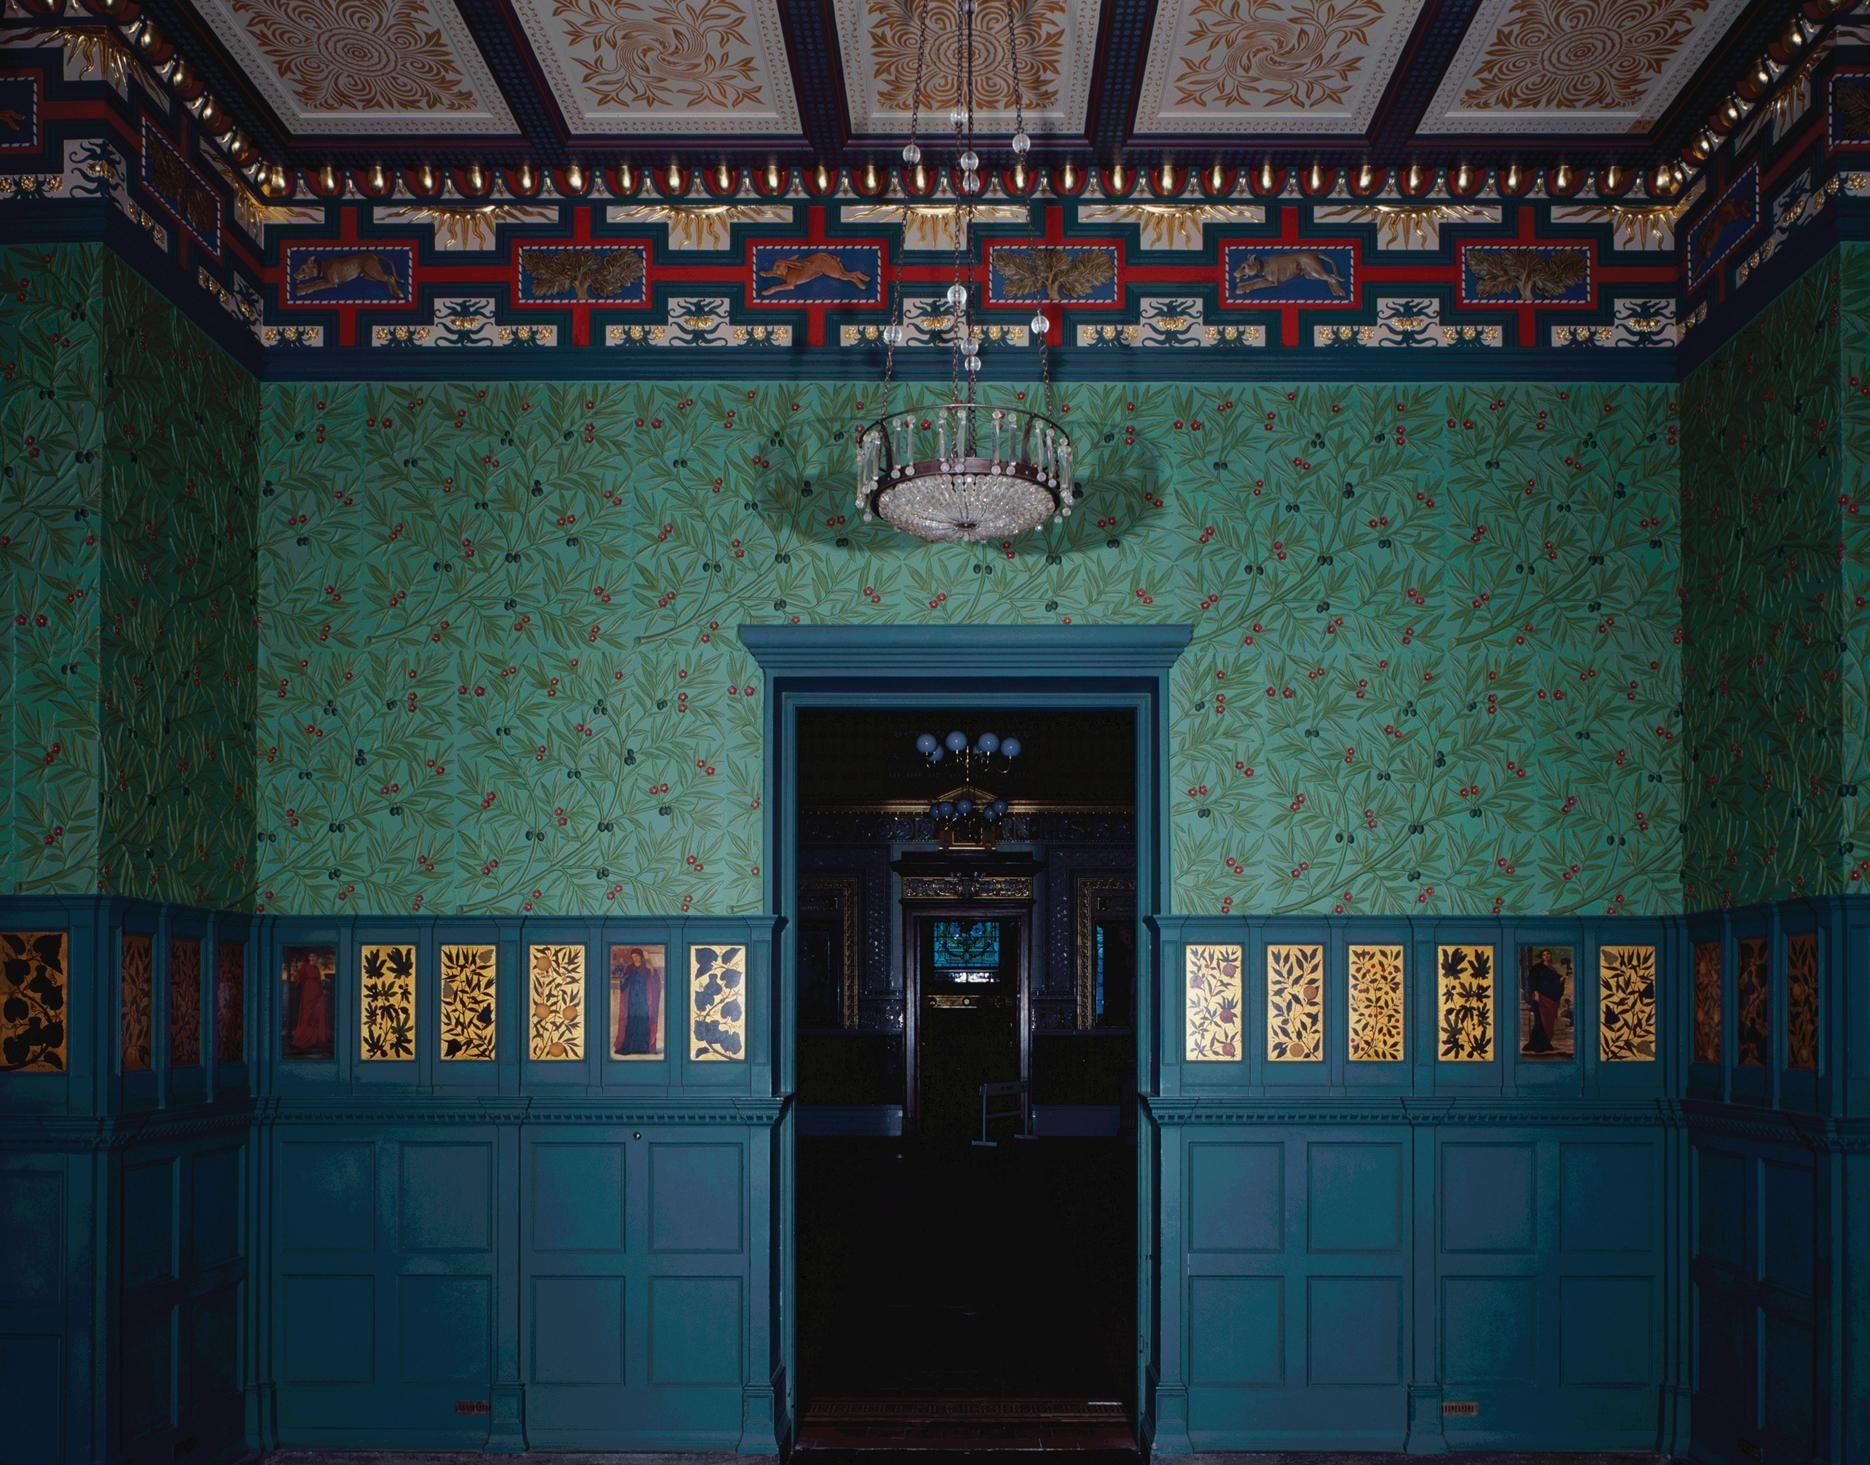 William Morris Green Dining Room 1867 Art Nouveau